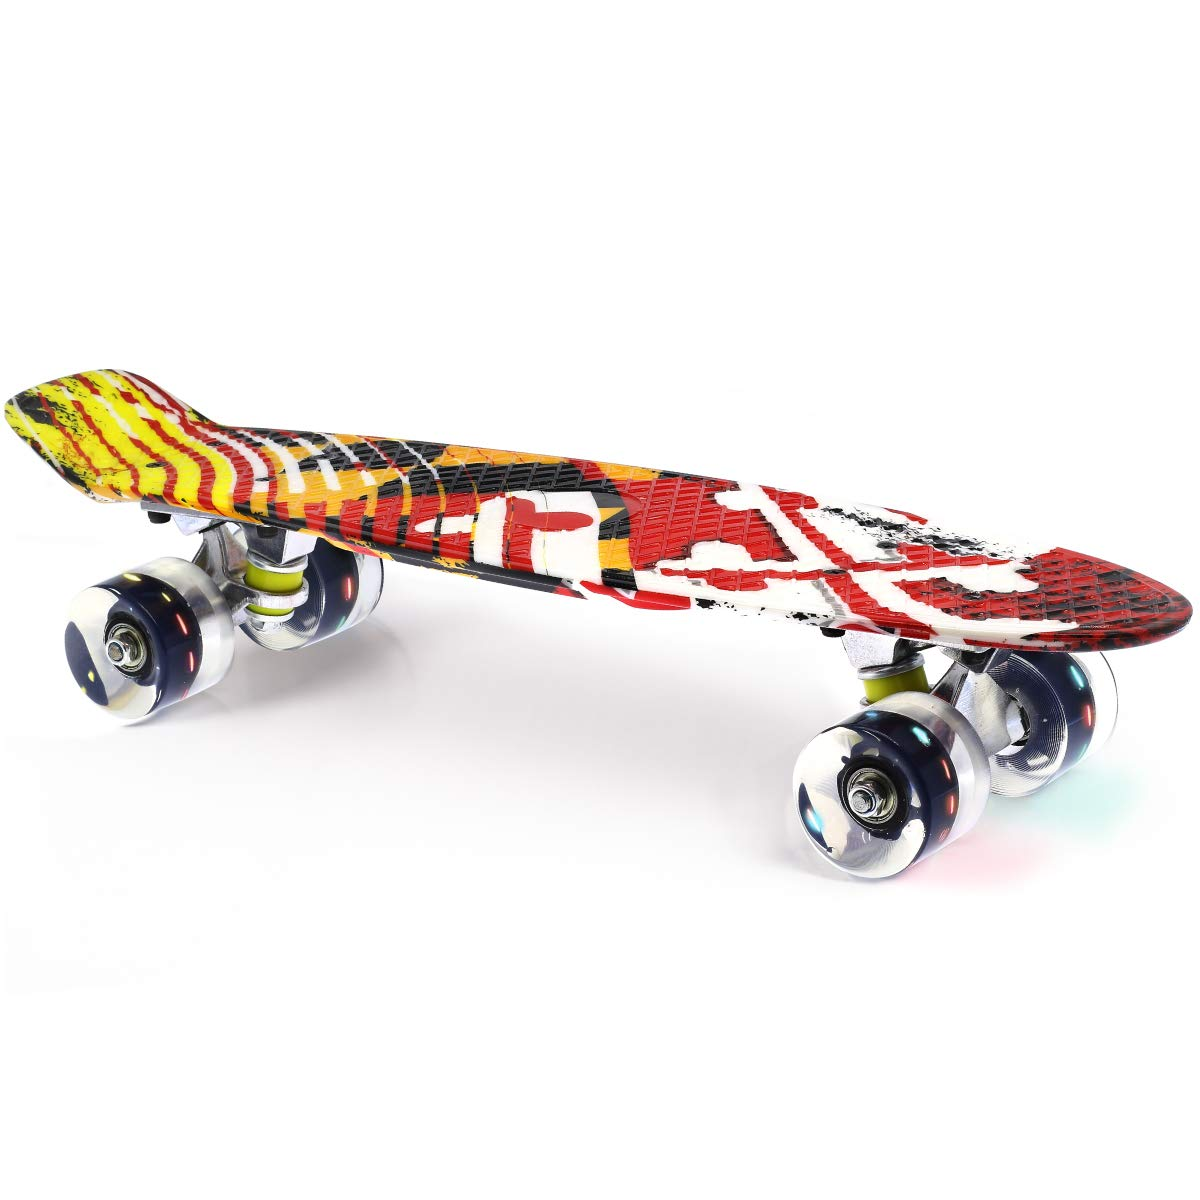 Merkapa 22'' Complete Skateboard with Colorful LED Light Up Wheels for Beginners (Black Wheels Board)